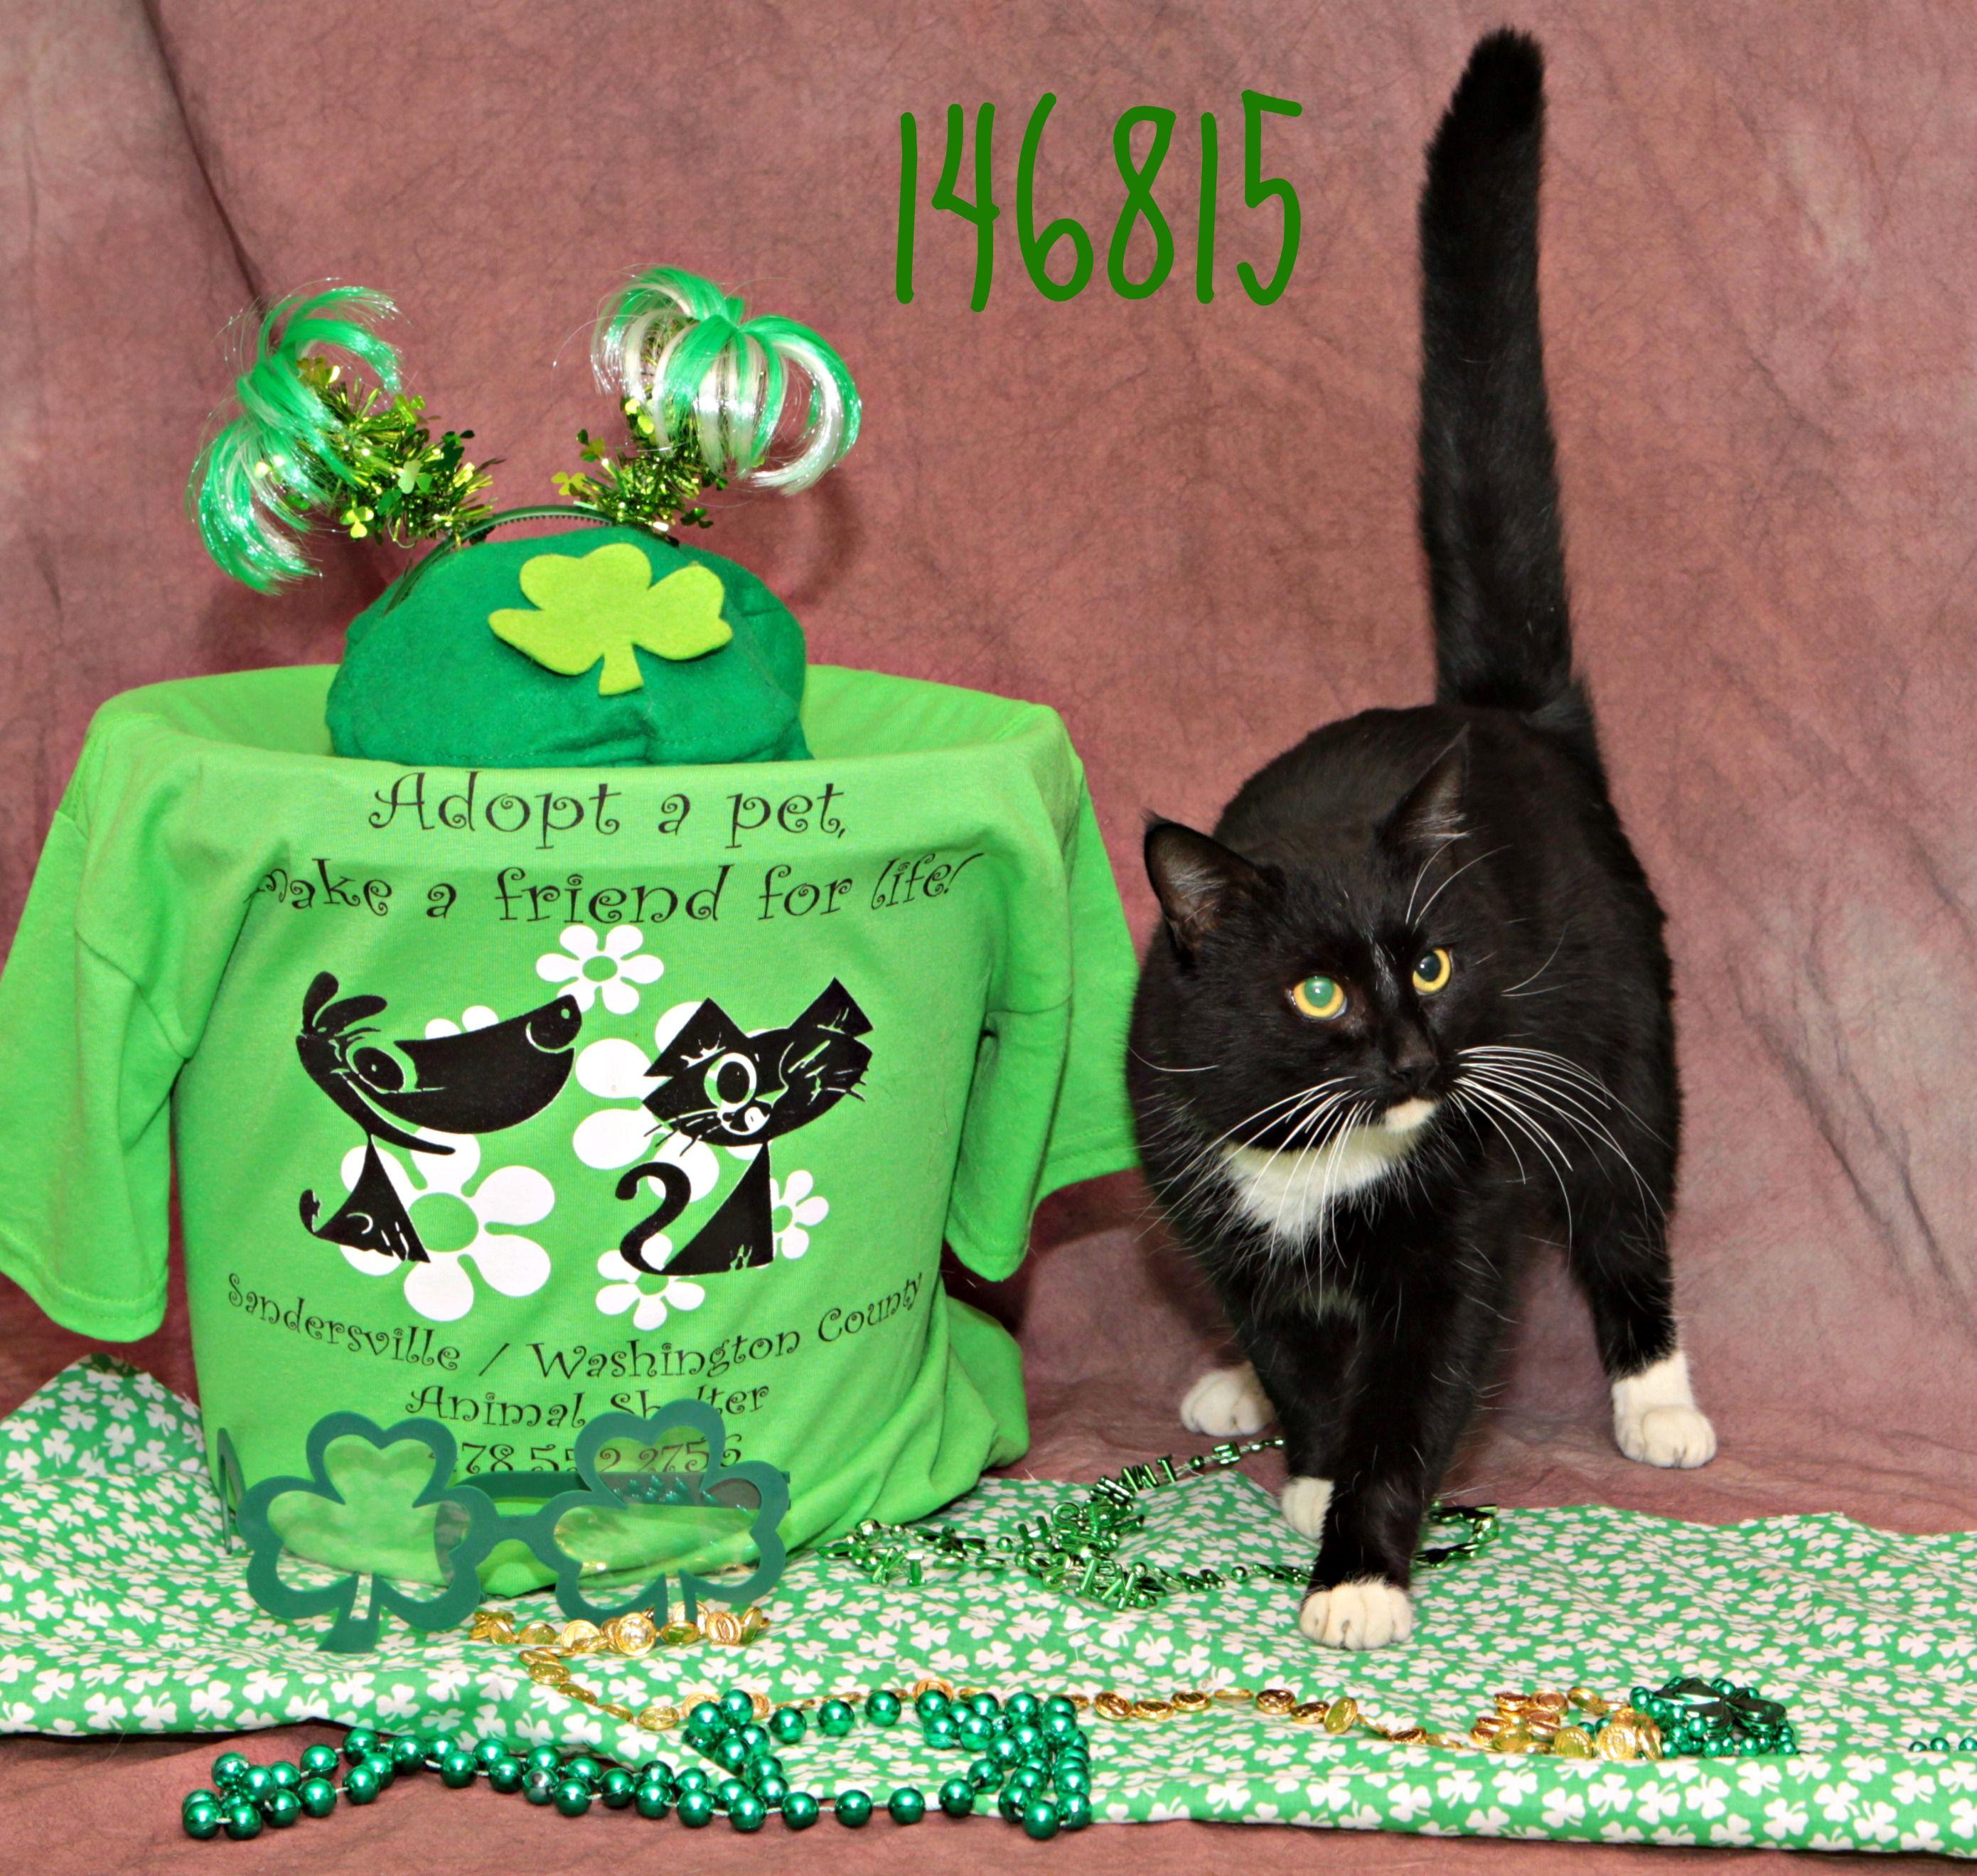 Greene Adopt Me Today For More Information Please Visit Www Sandersvilleanimalshelter Com I Am Located In Sandersville Ga Animal Shelter Adoption Pets